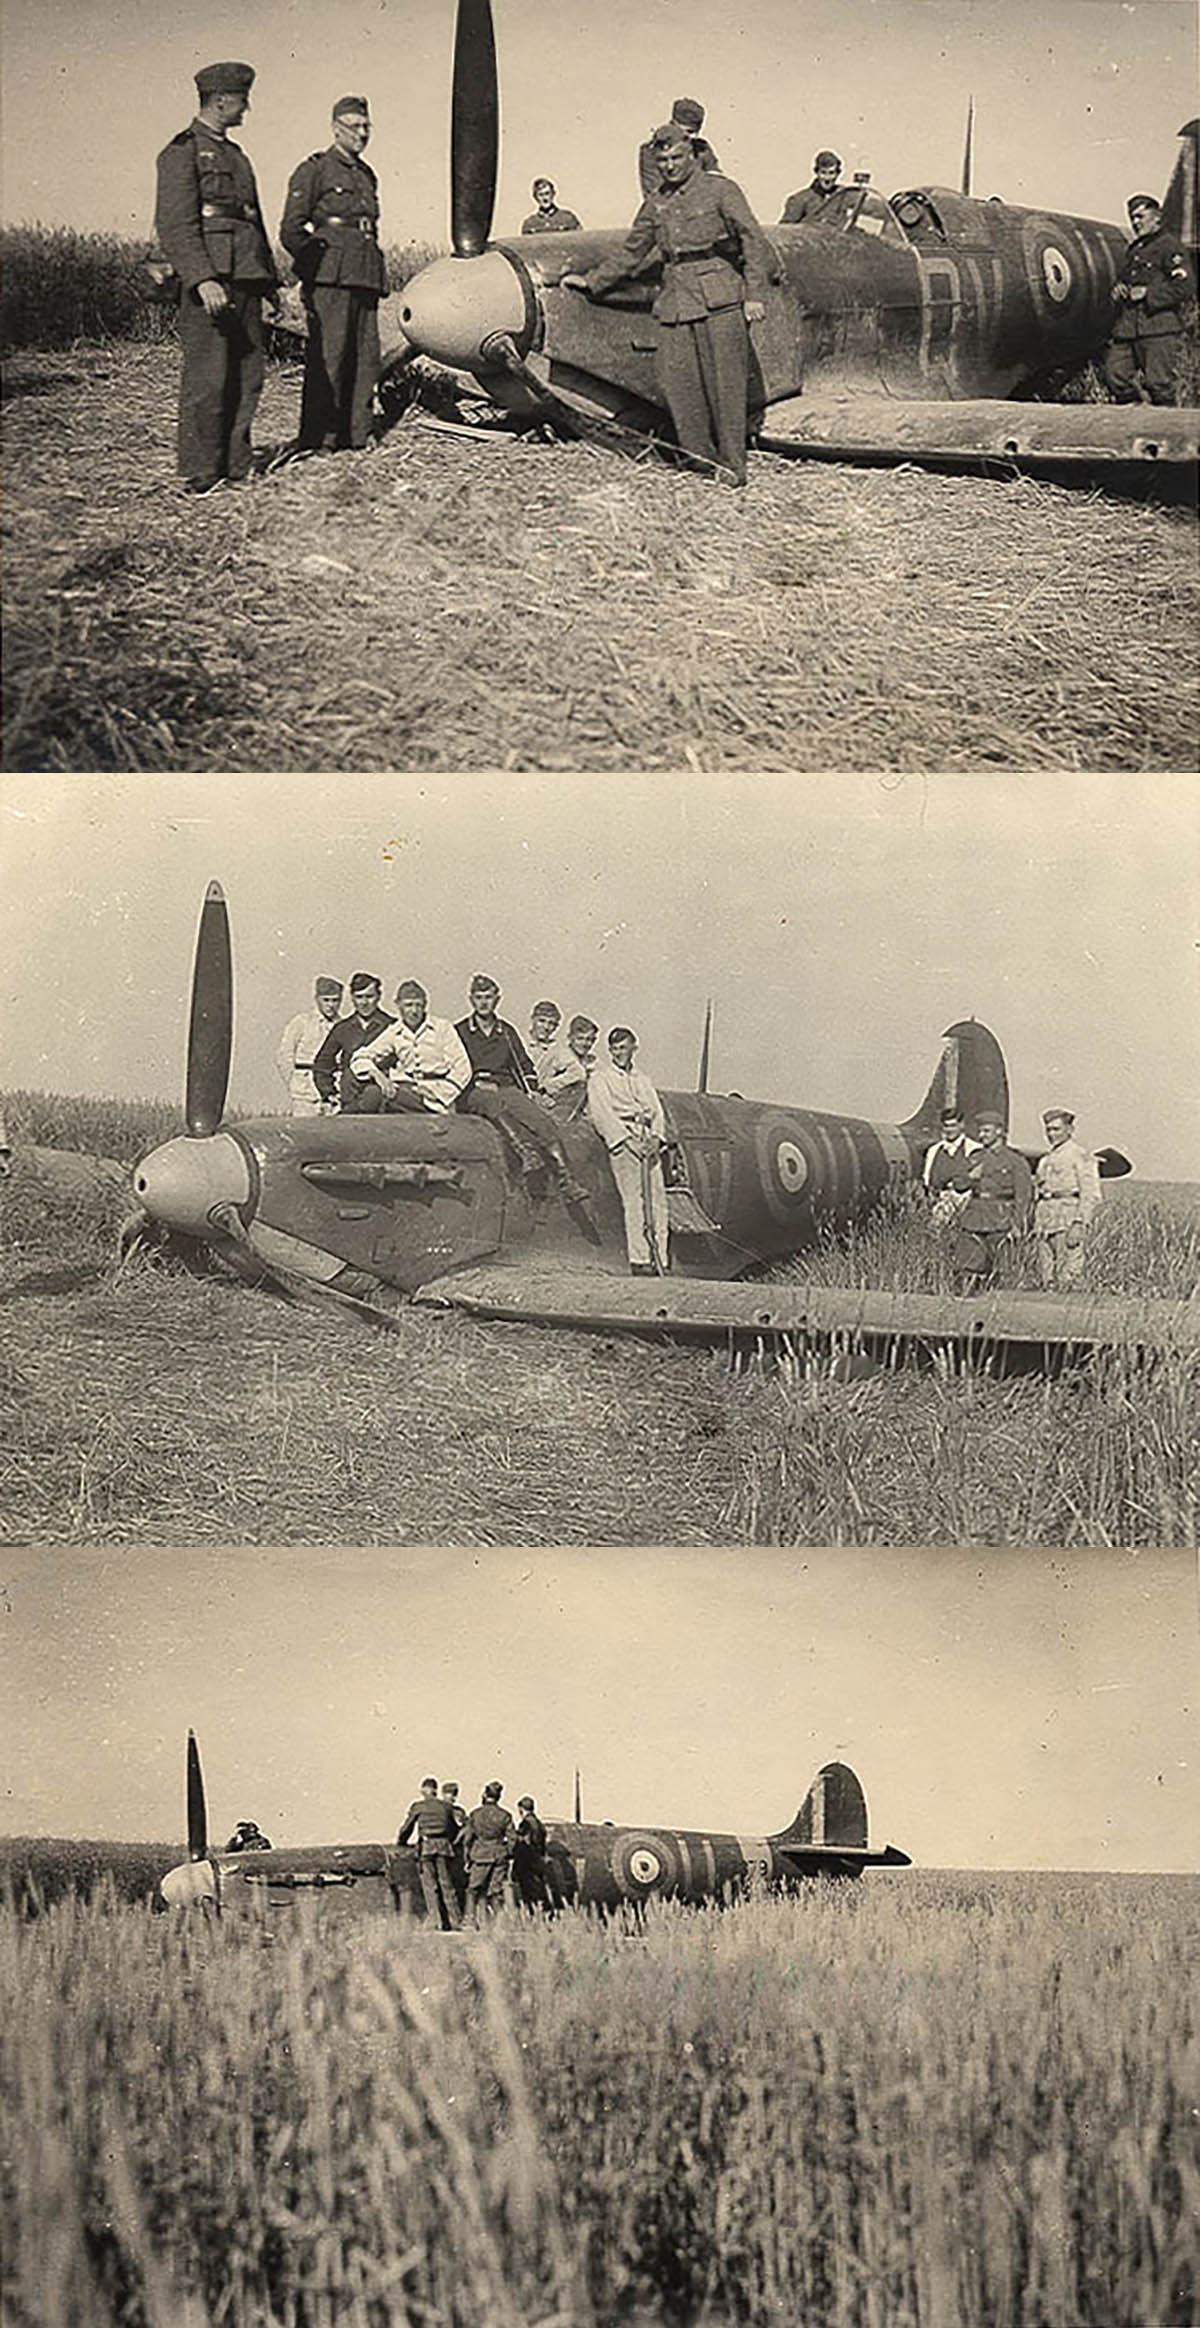 Spitfire MkIIa RAF 19Sqn QVU P7379 sd by Bf 109 and PO Andrews KIA 27th Jun 1941 03